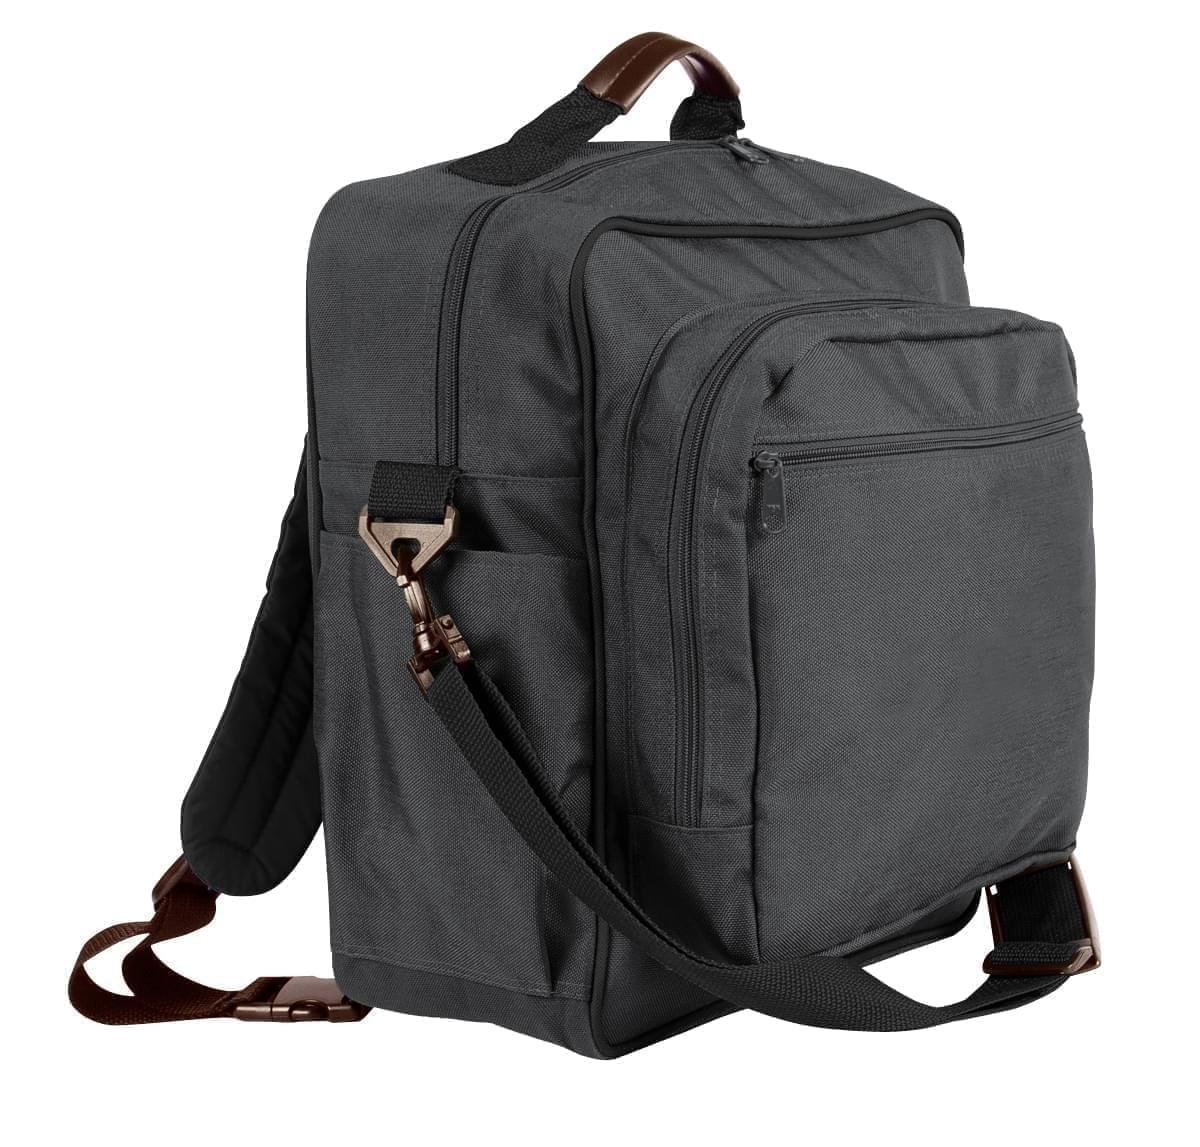 USA Made Poly Daypack Rucksacks, Graphite-Black, 1070-ARR